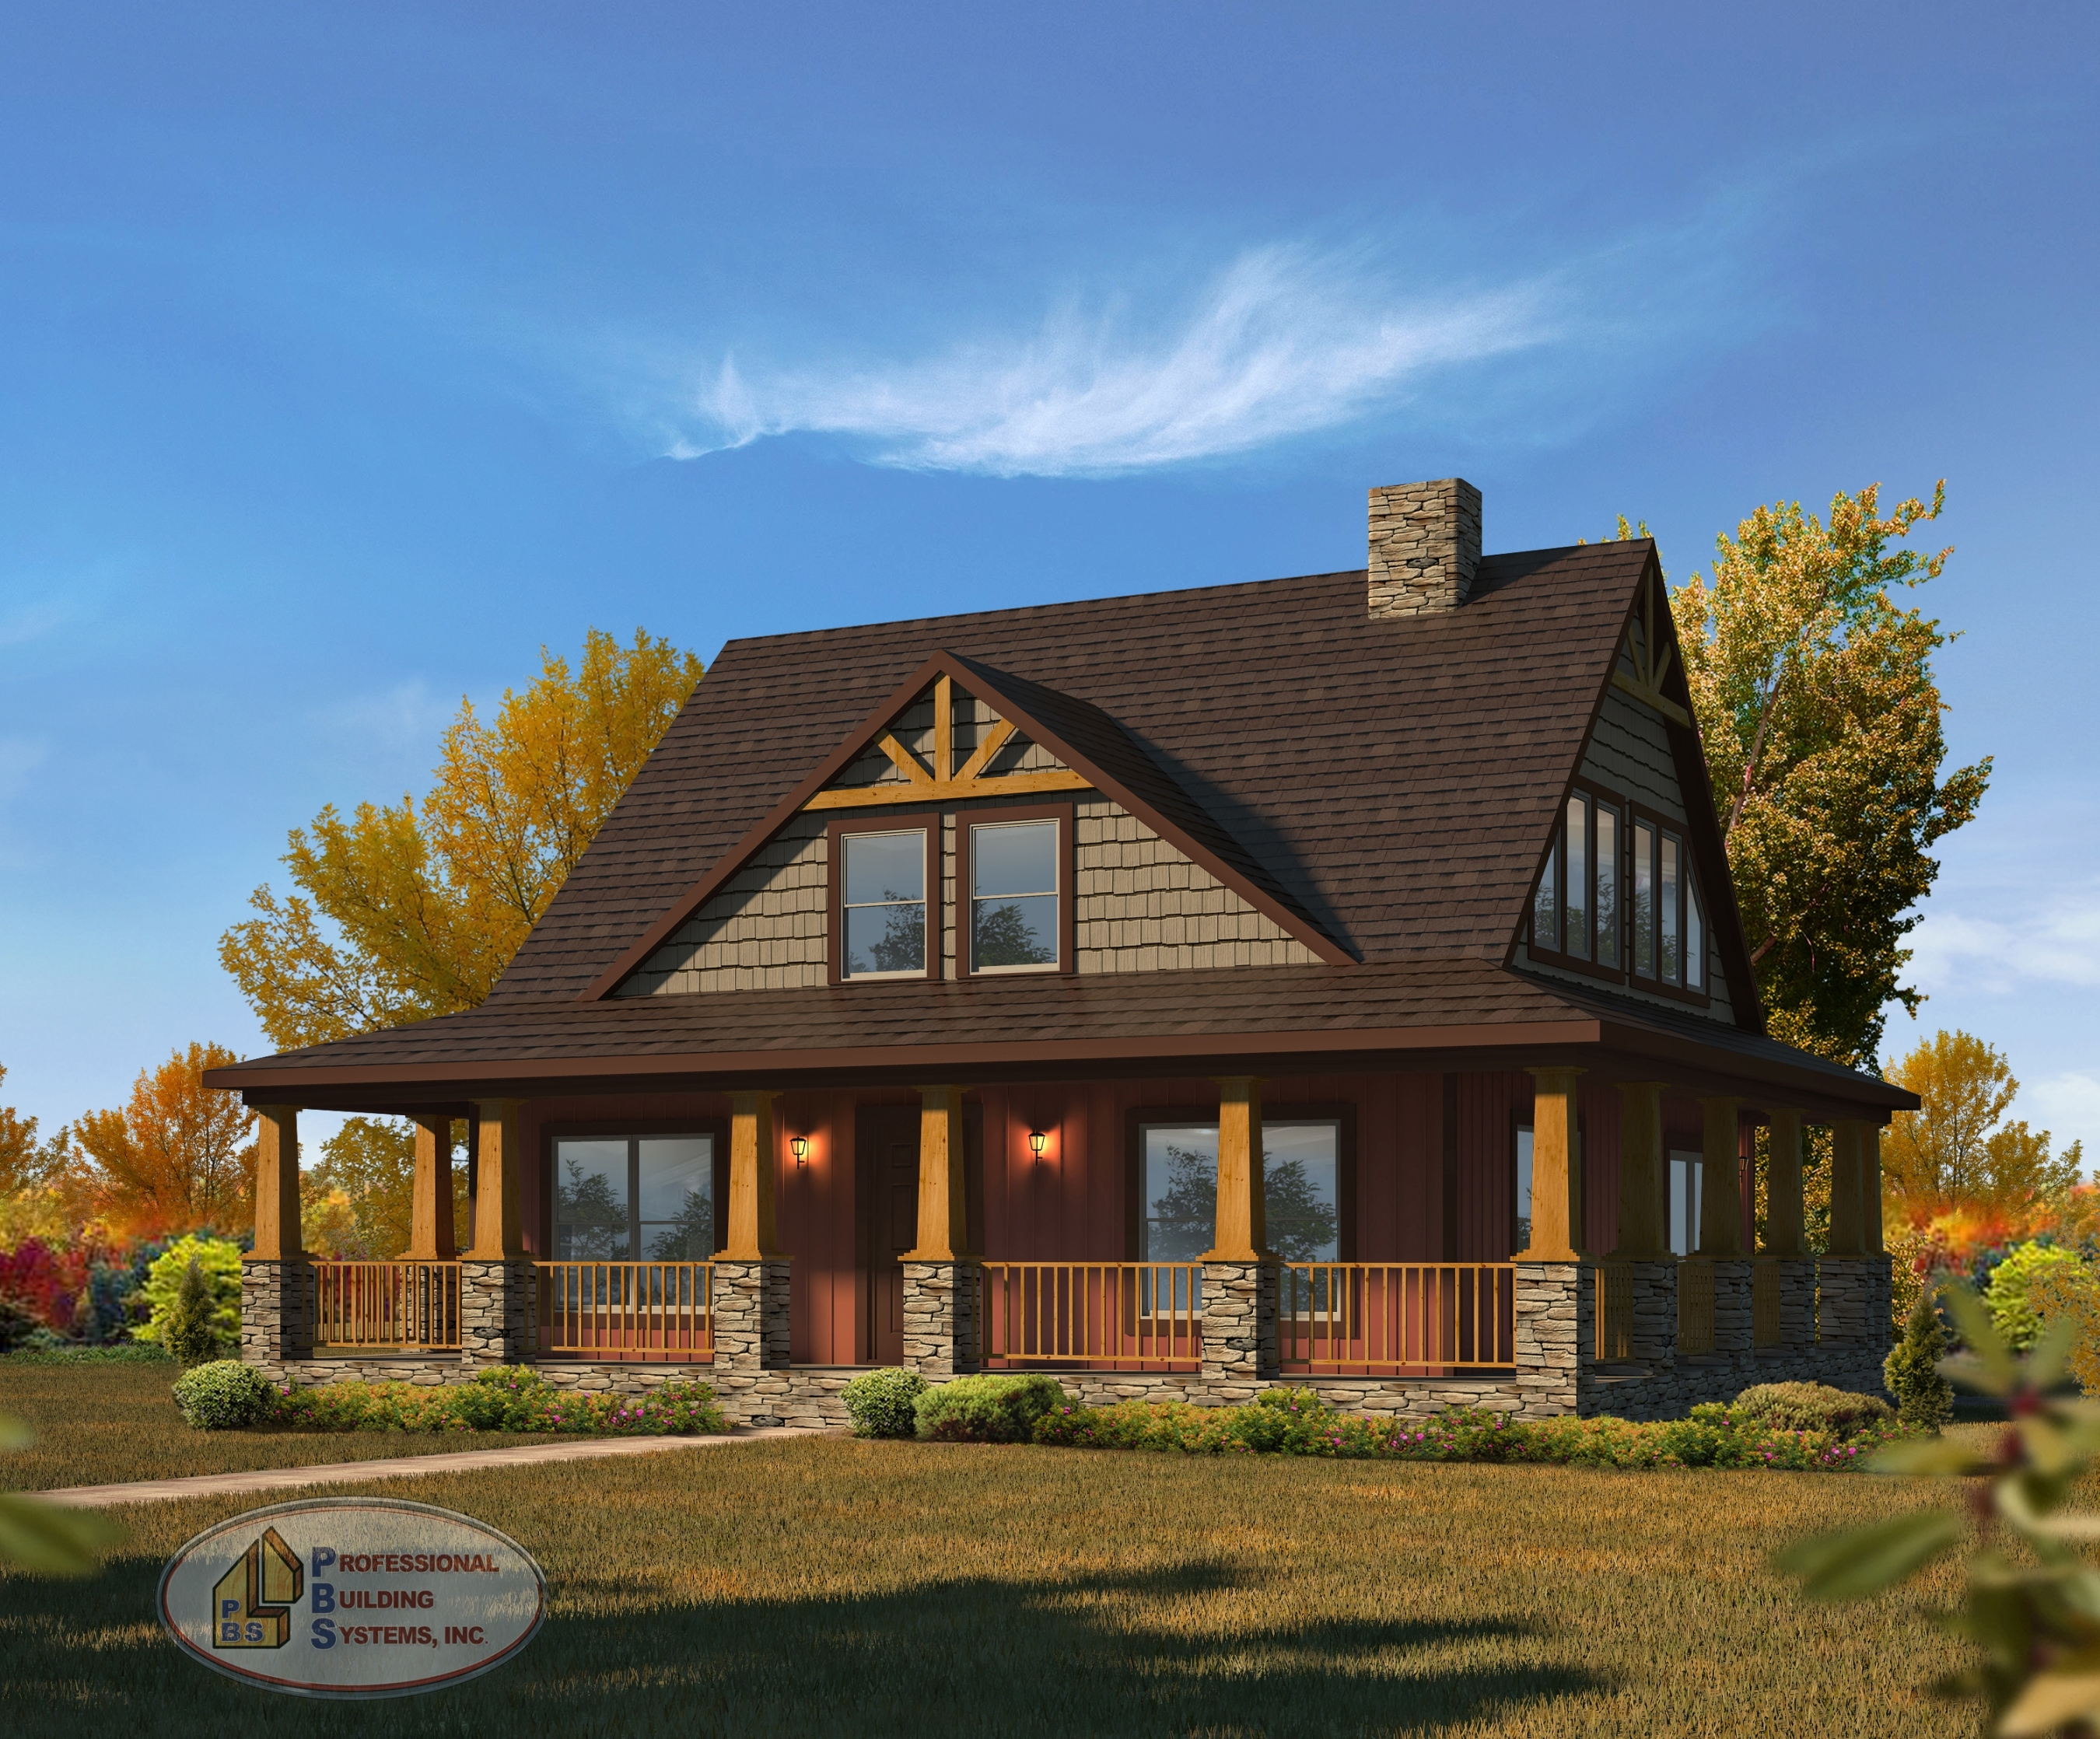 Village Homes - ad image